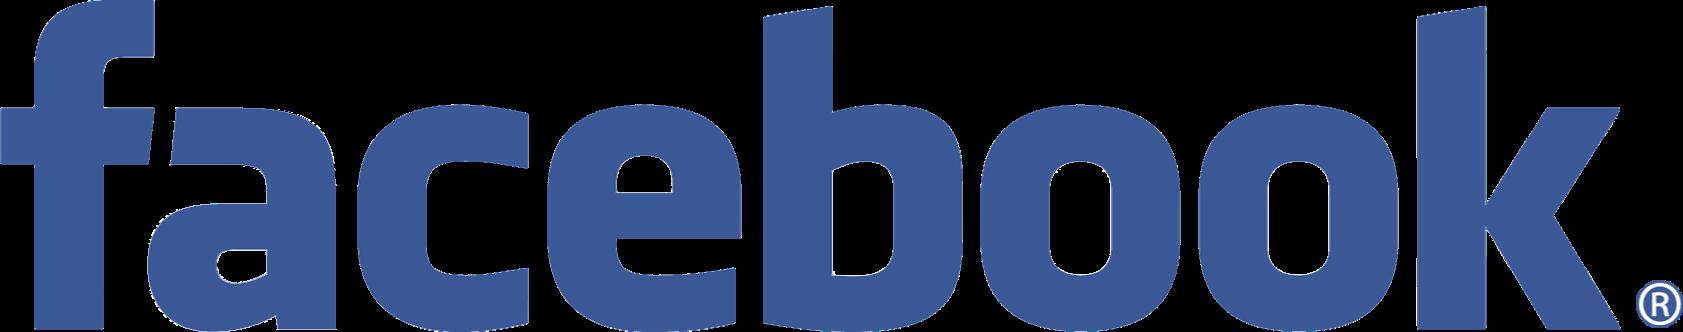 Facebook Autonálepky